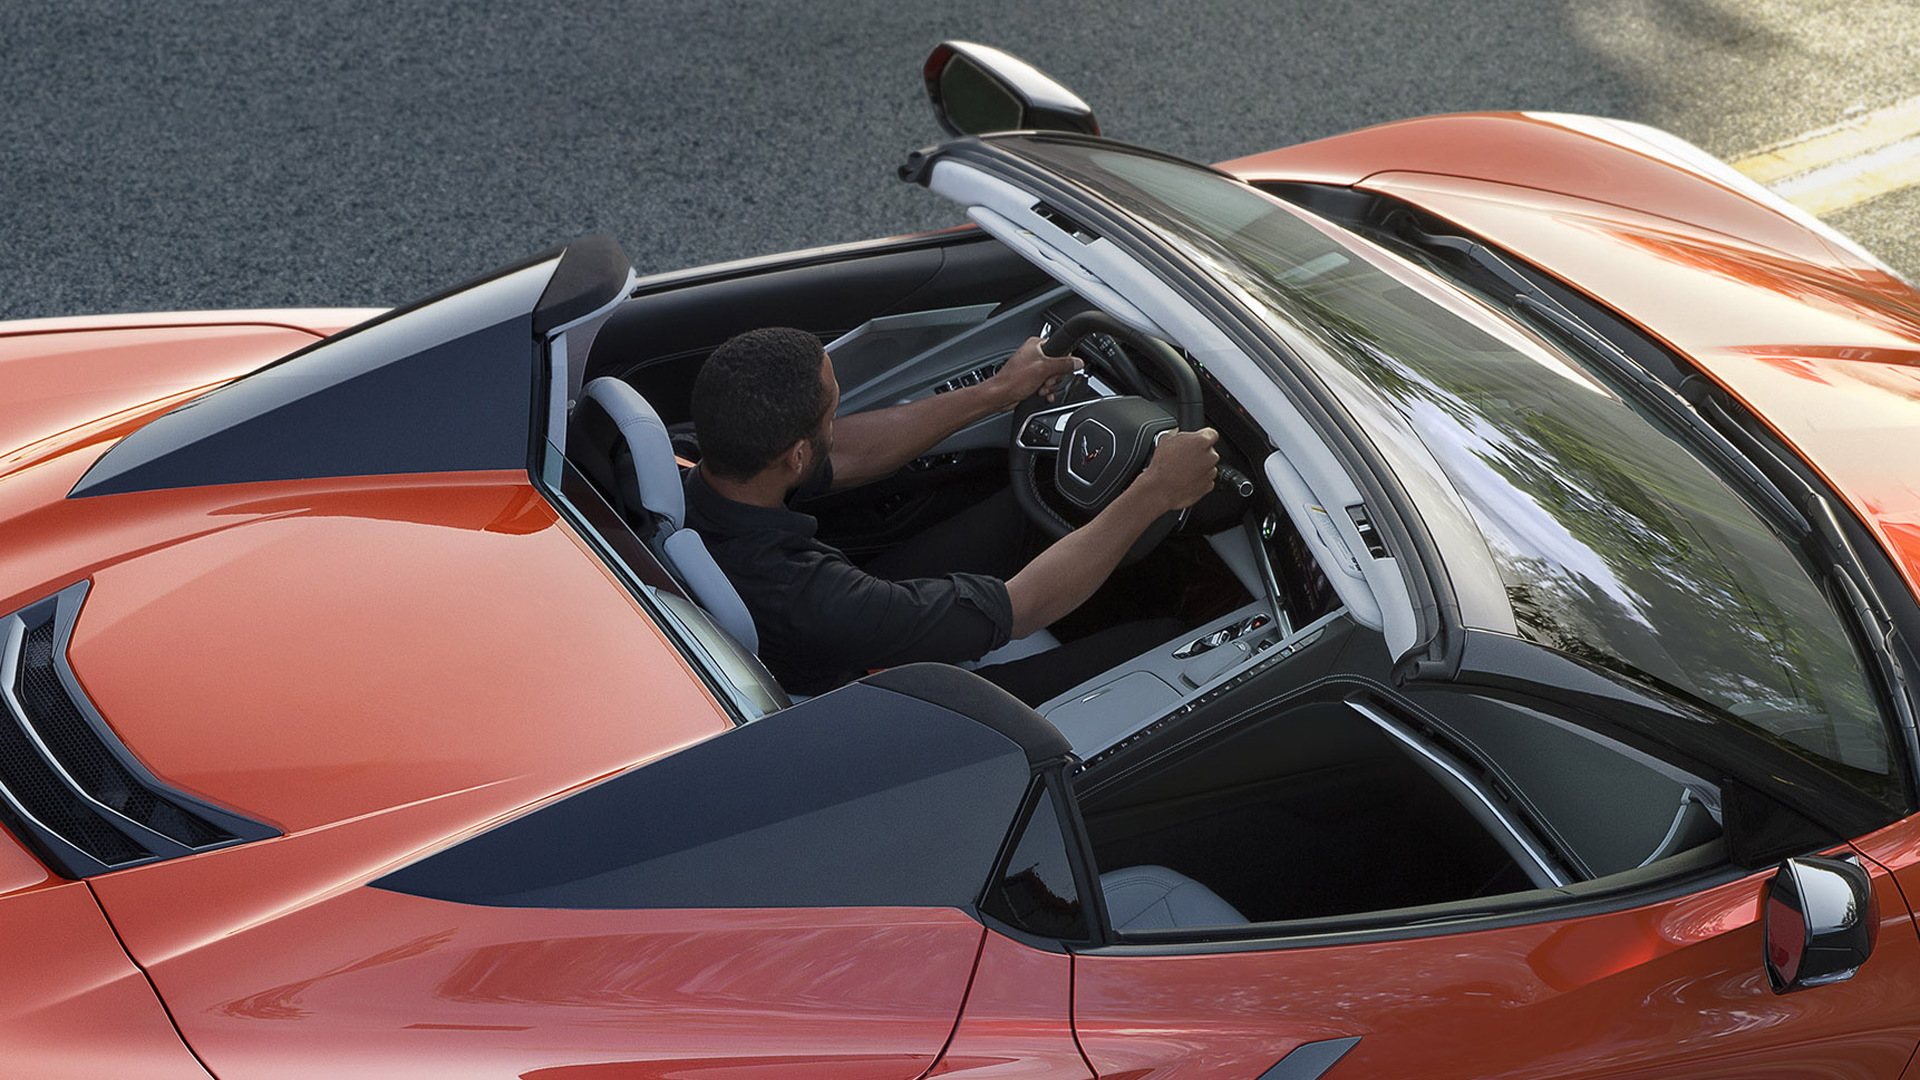 Chevrolet Corvette hard-top convertible revealed